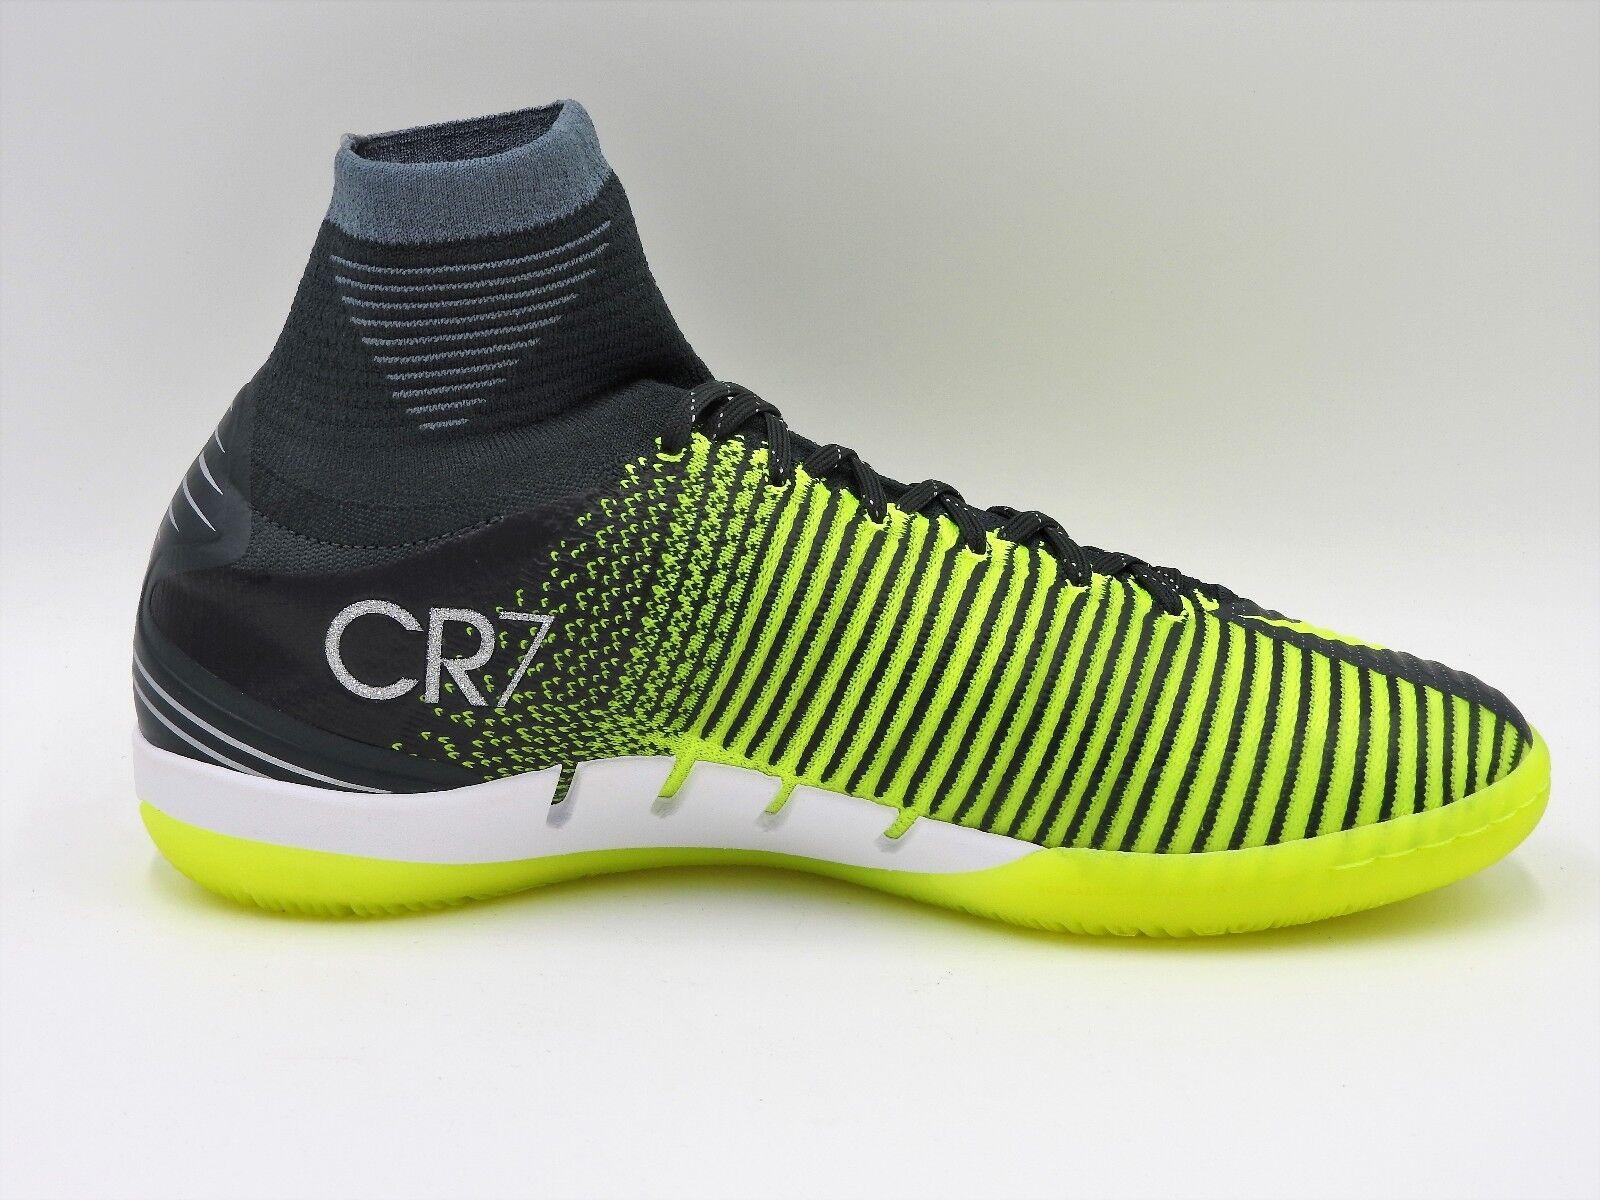 Nike Mercurial X Proximo II IC Soccer